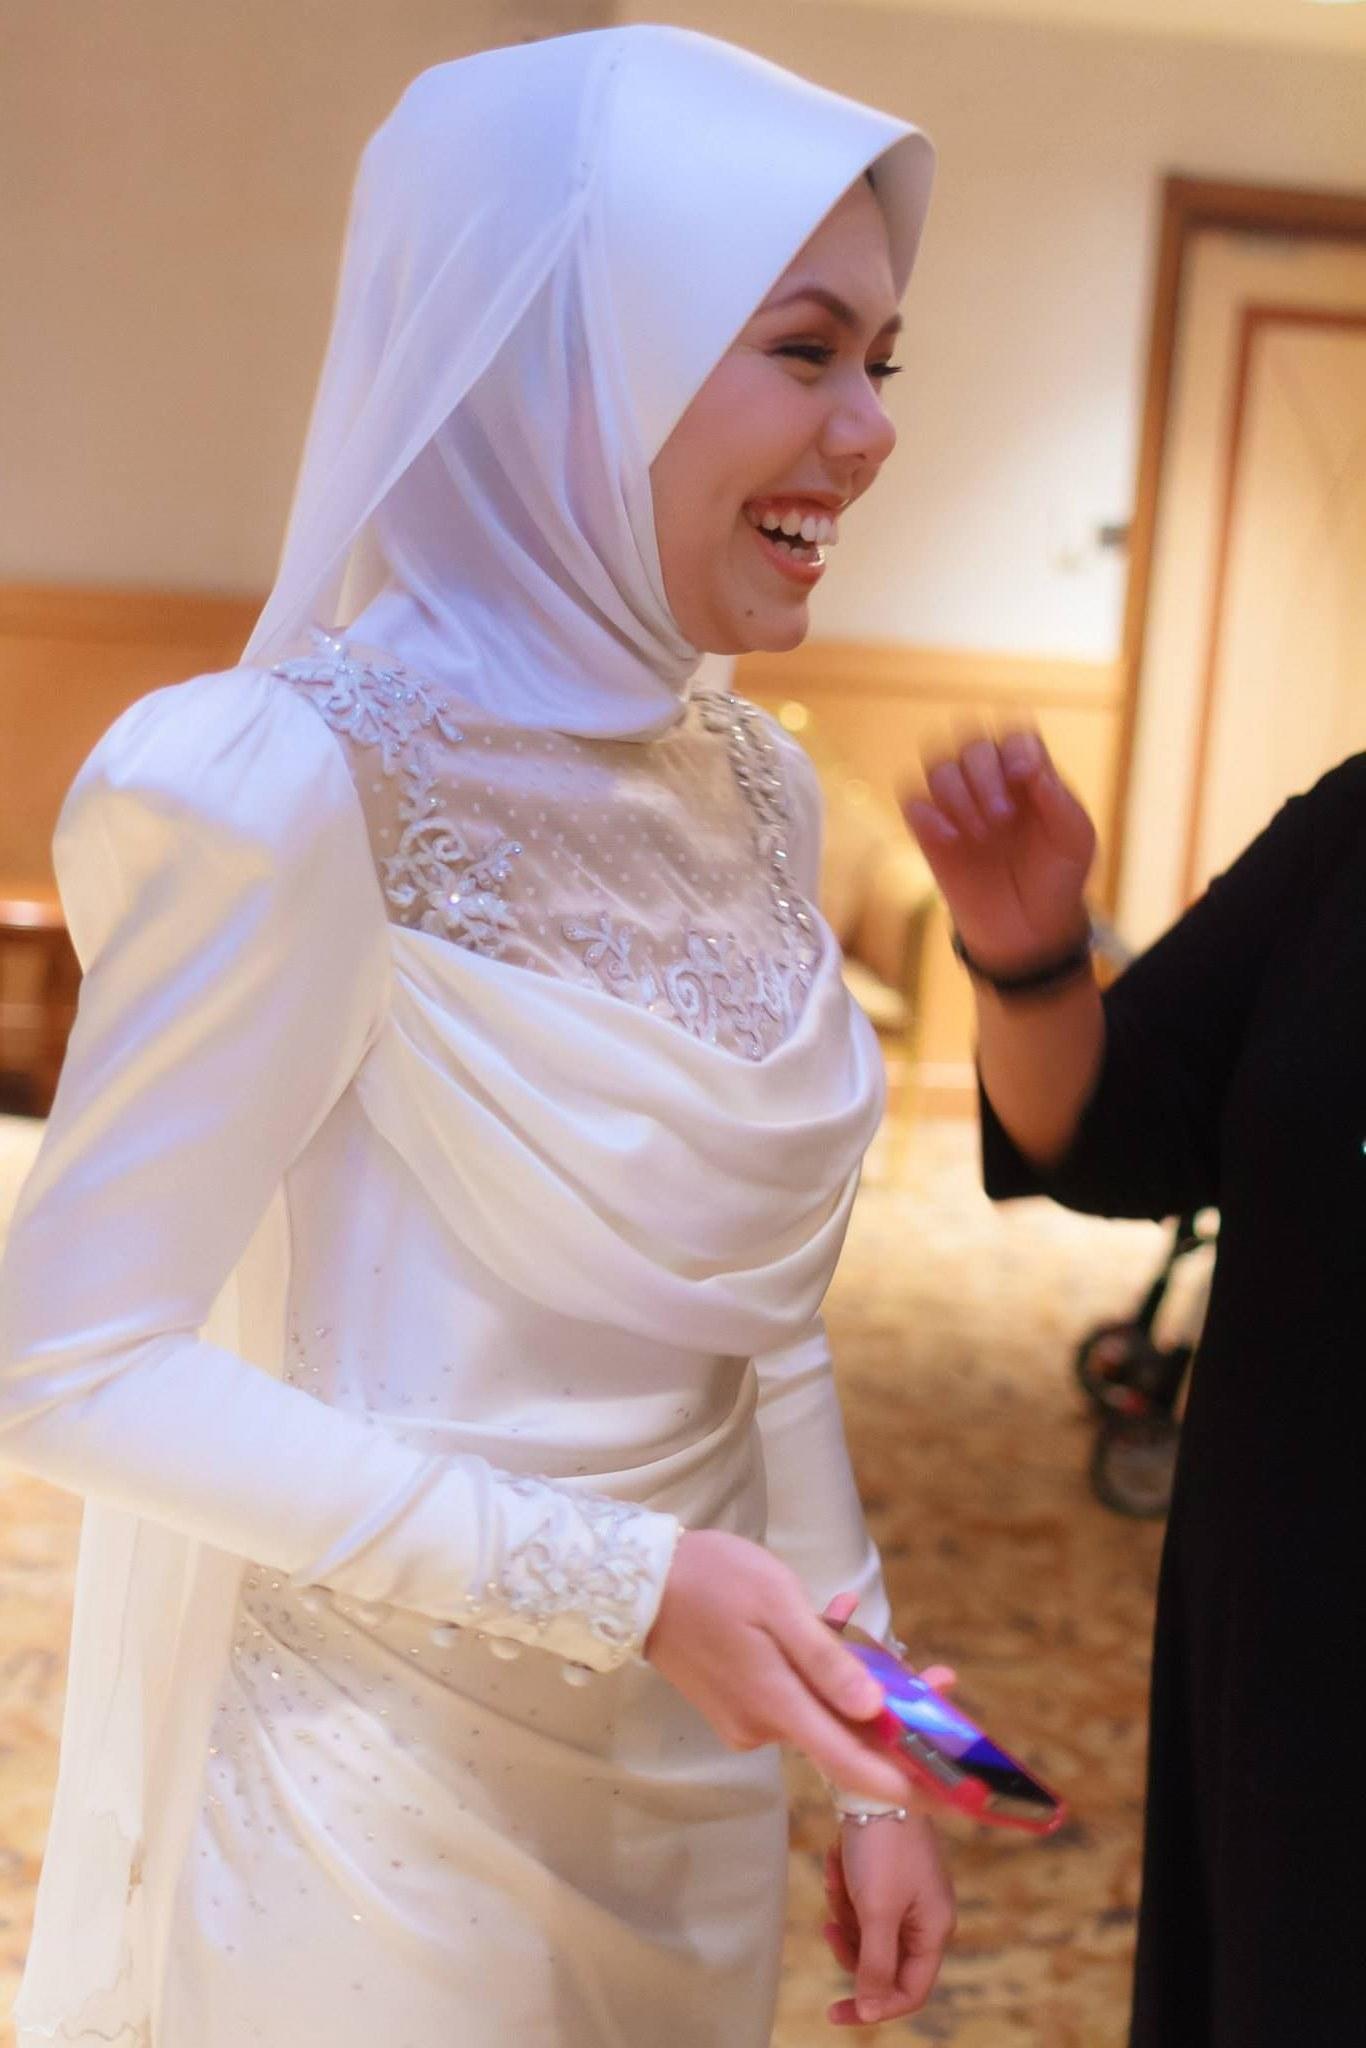 Design Gaun Pengantin 2016 Muslim O2d5 Baju Pengantin Moden Baju Pengantin songket by Melinda